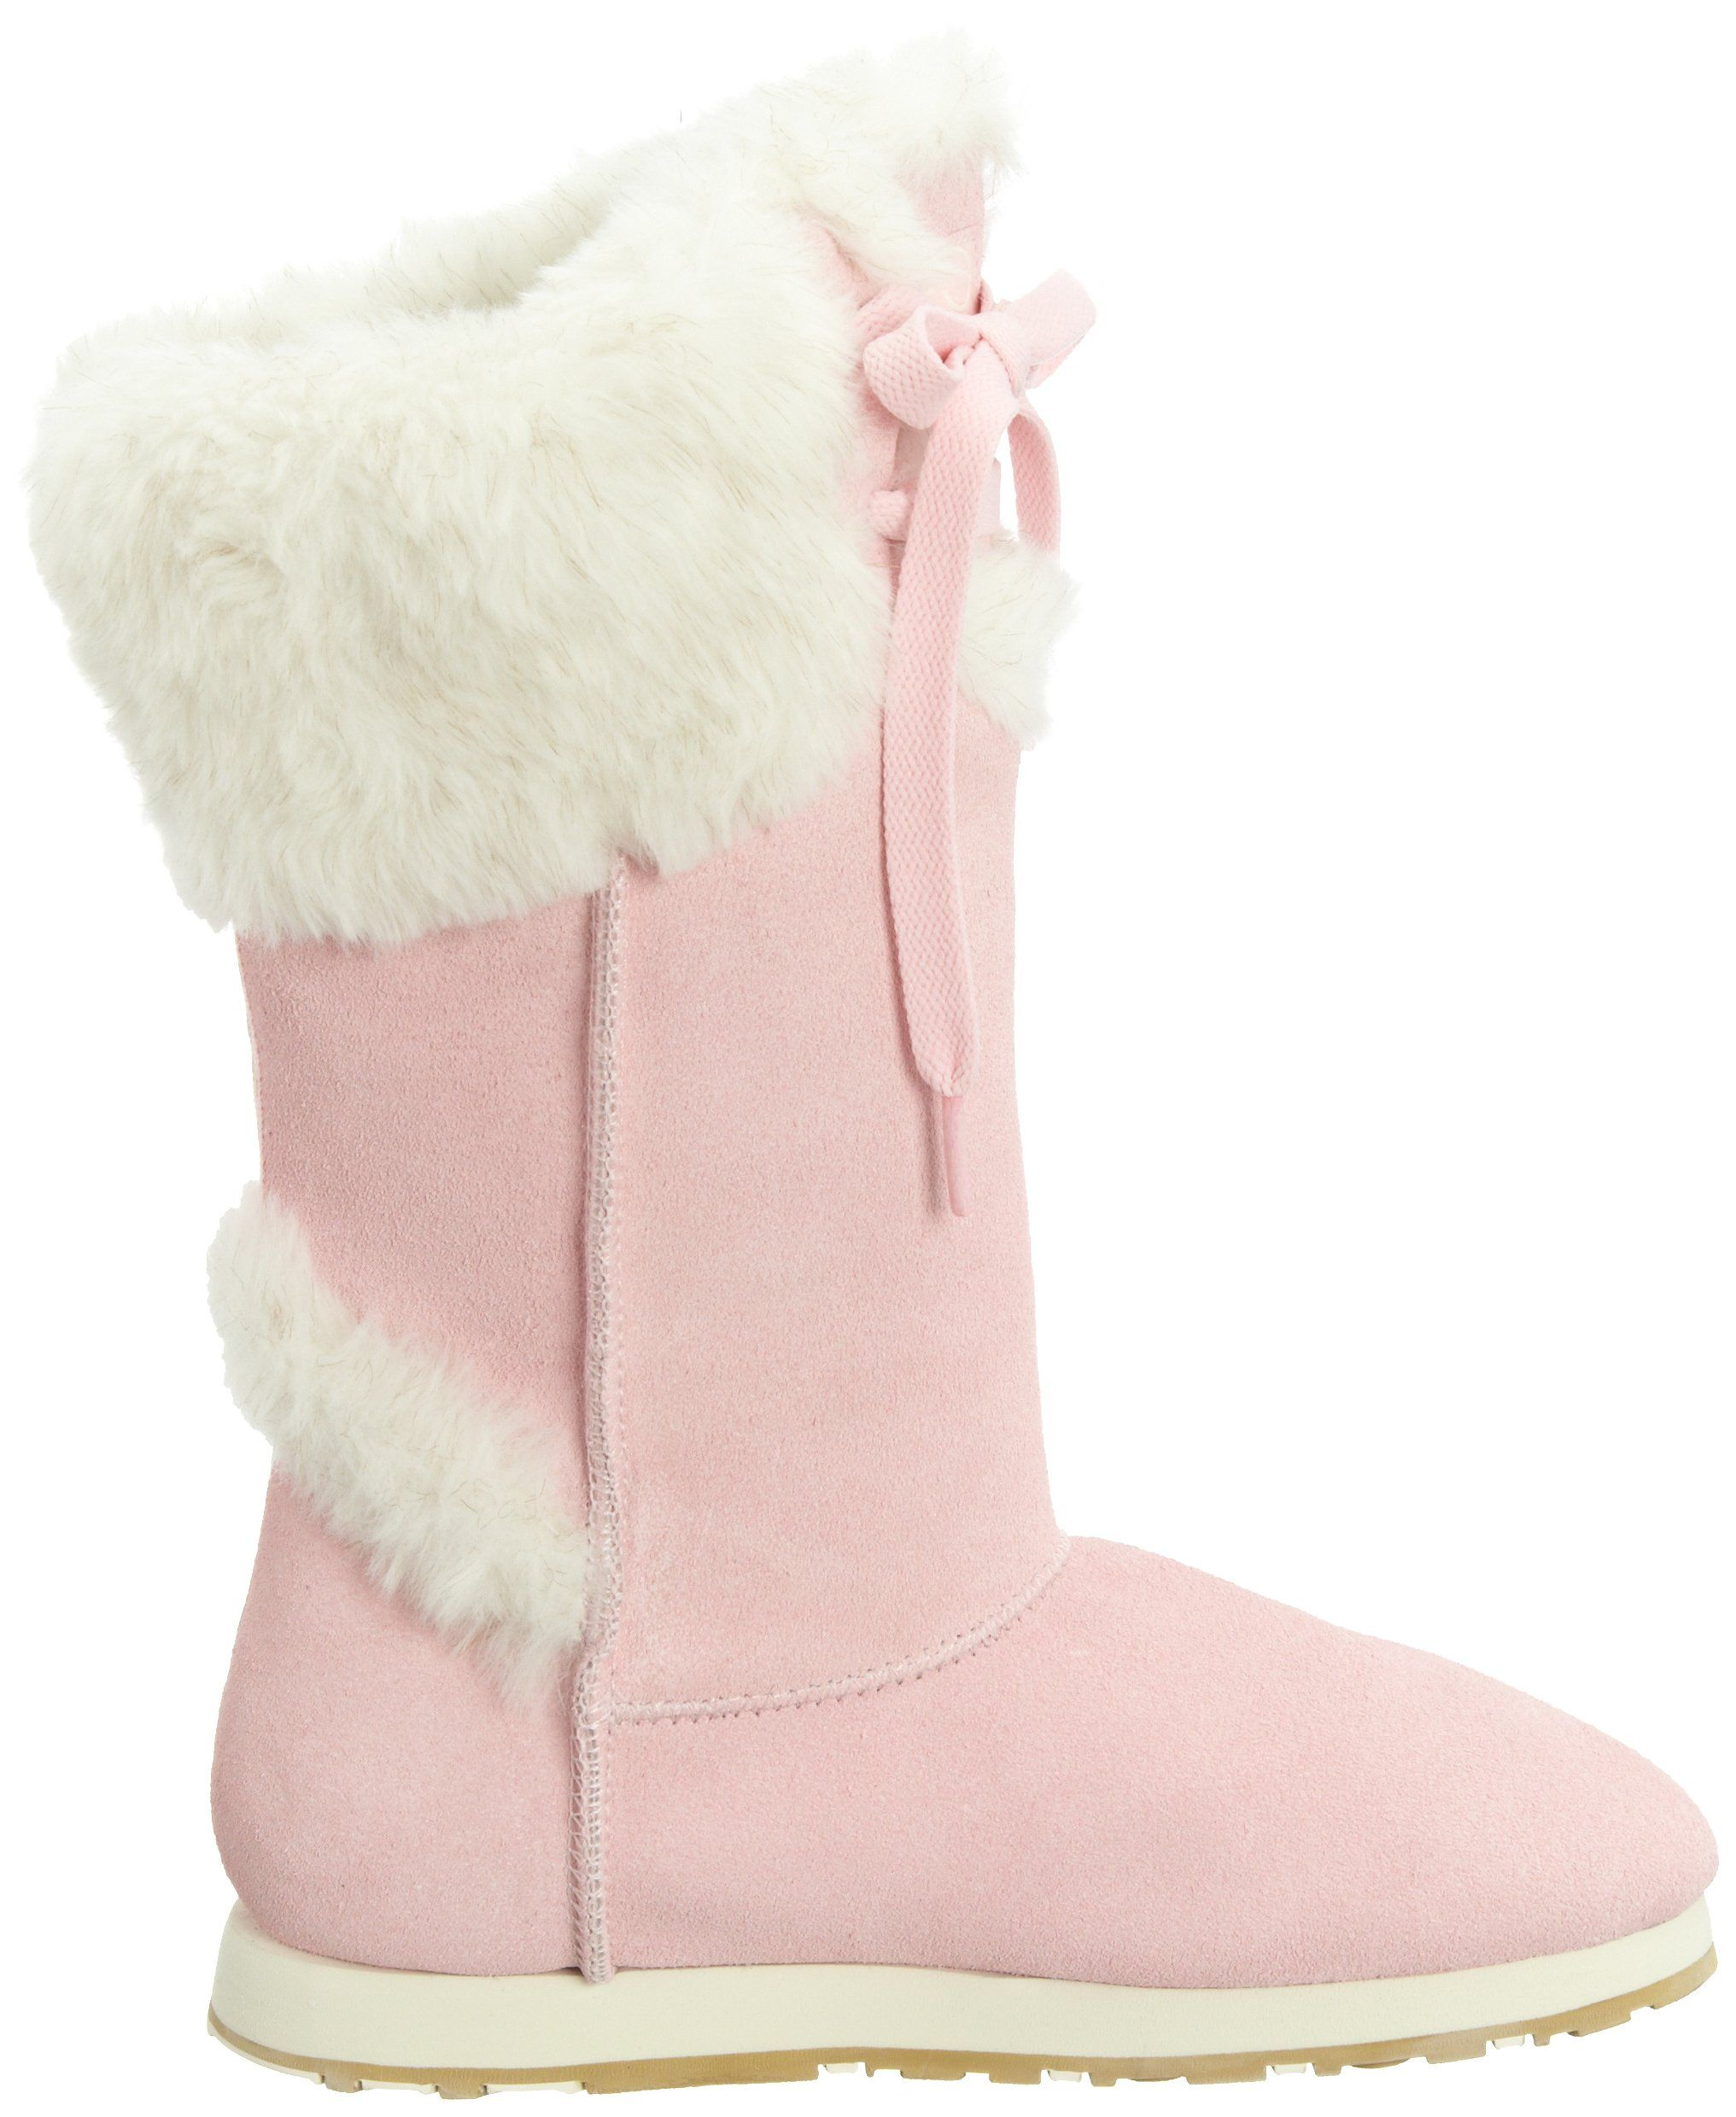 Adidas Neo Women's Seneo Boots US9 Pink   Boots, Adidas